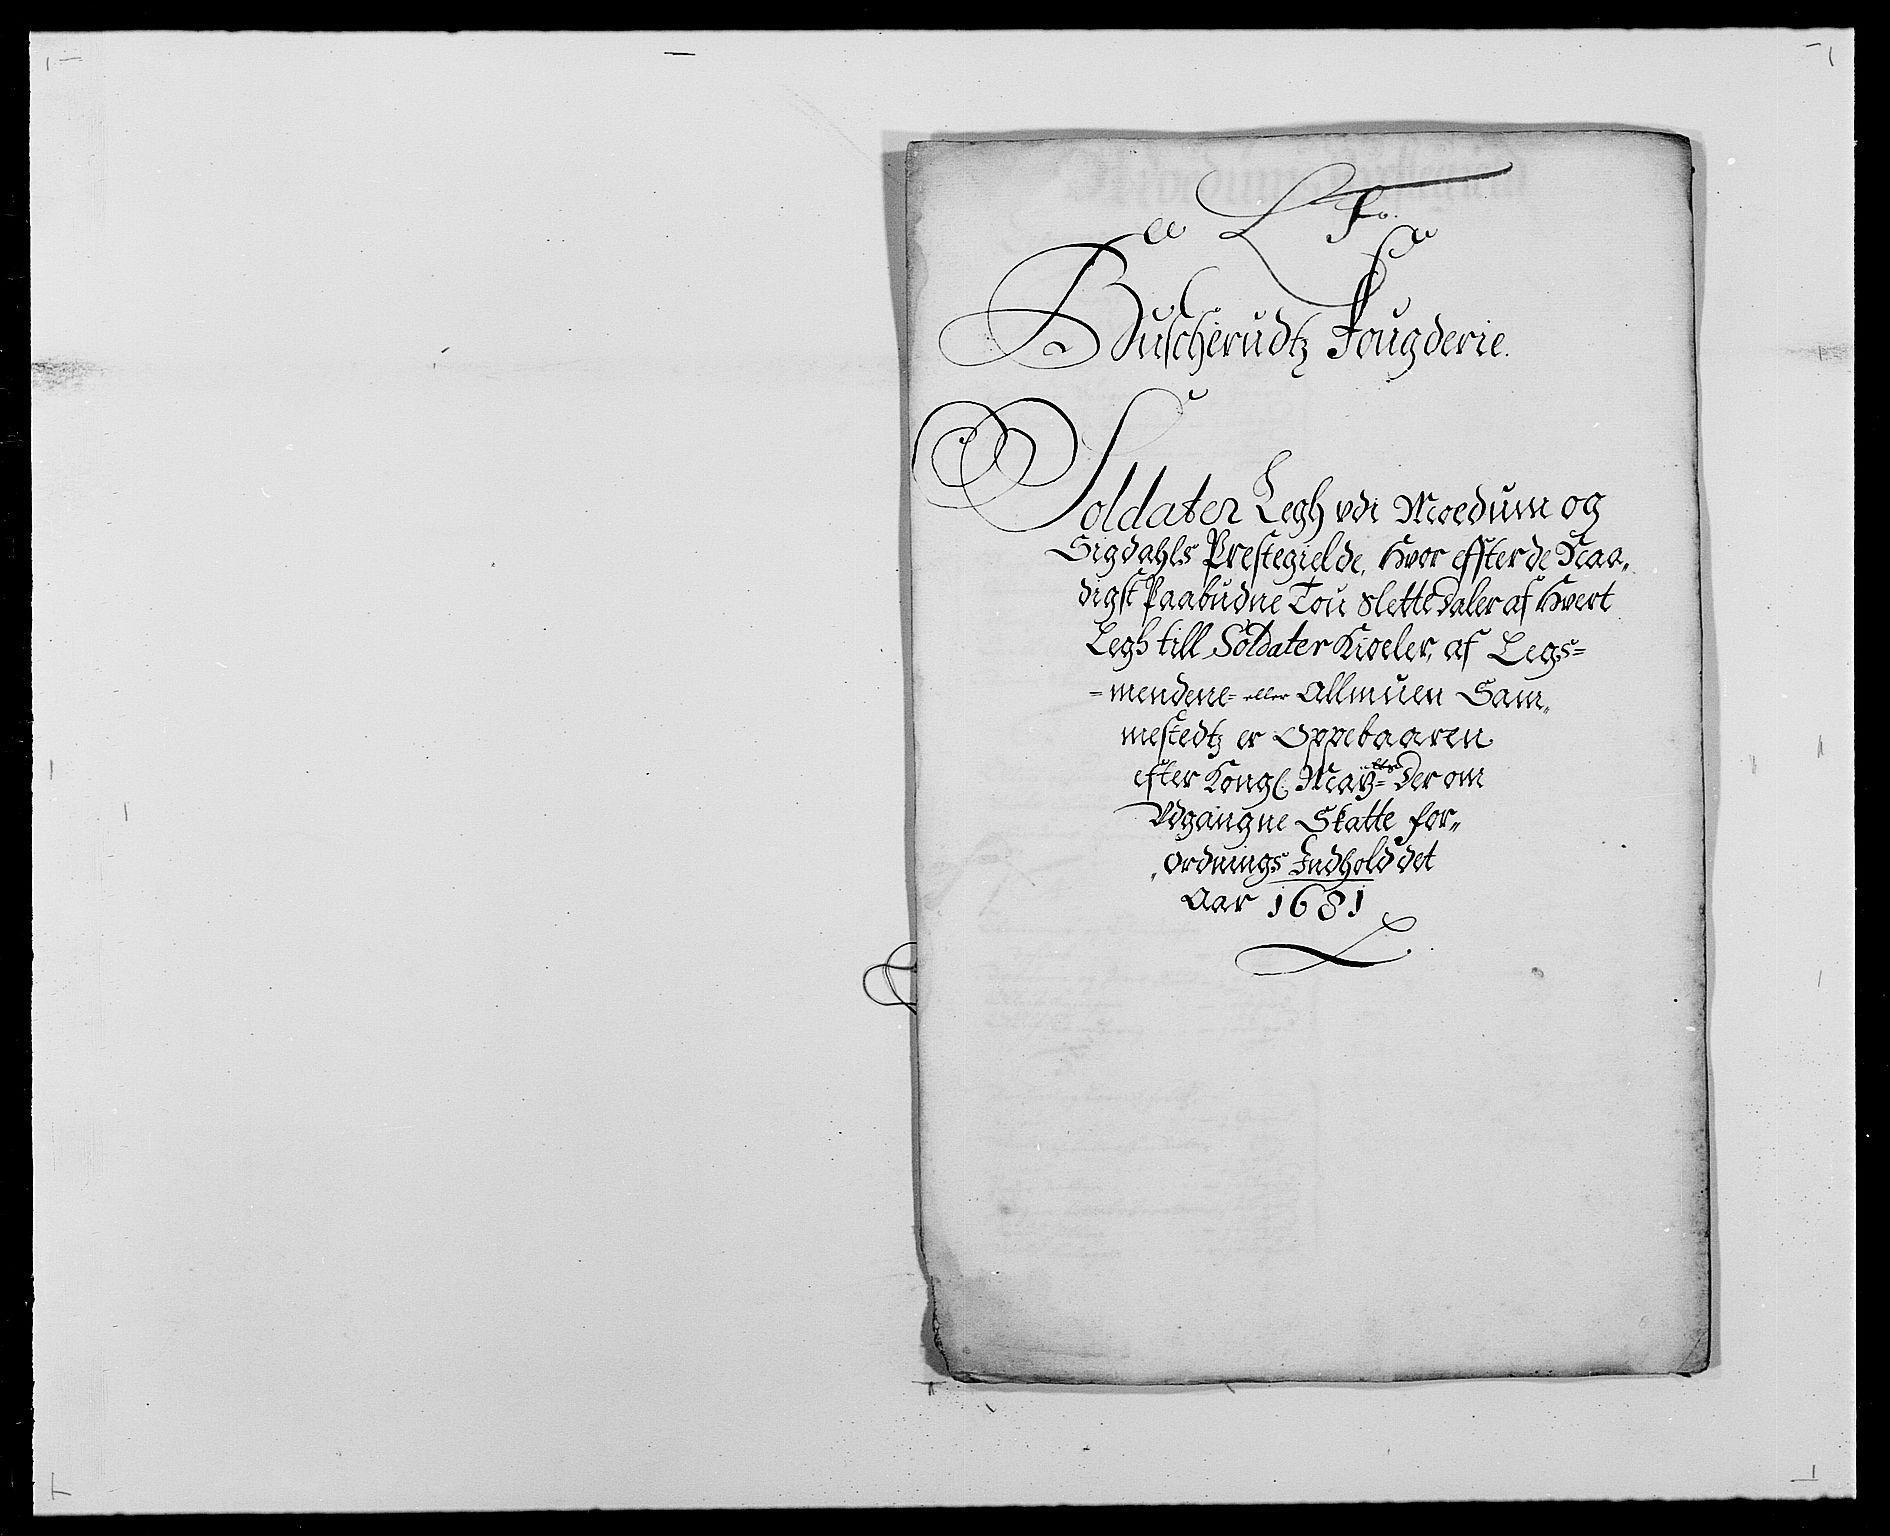 RA, Rentekammeret inntil 1814, Reviderte regnskaper, Fogderegnskap, R25/L1675: Fogderegnskap Buskerud, 1678-1681, s. 323